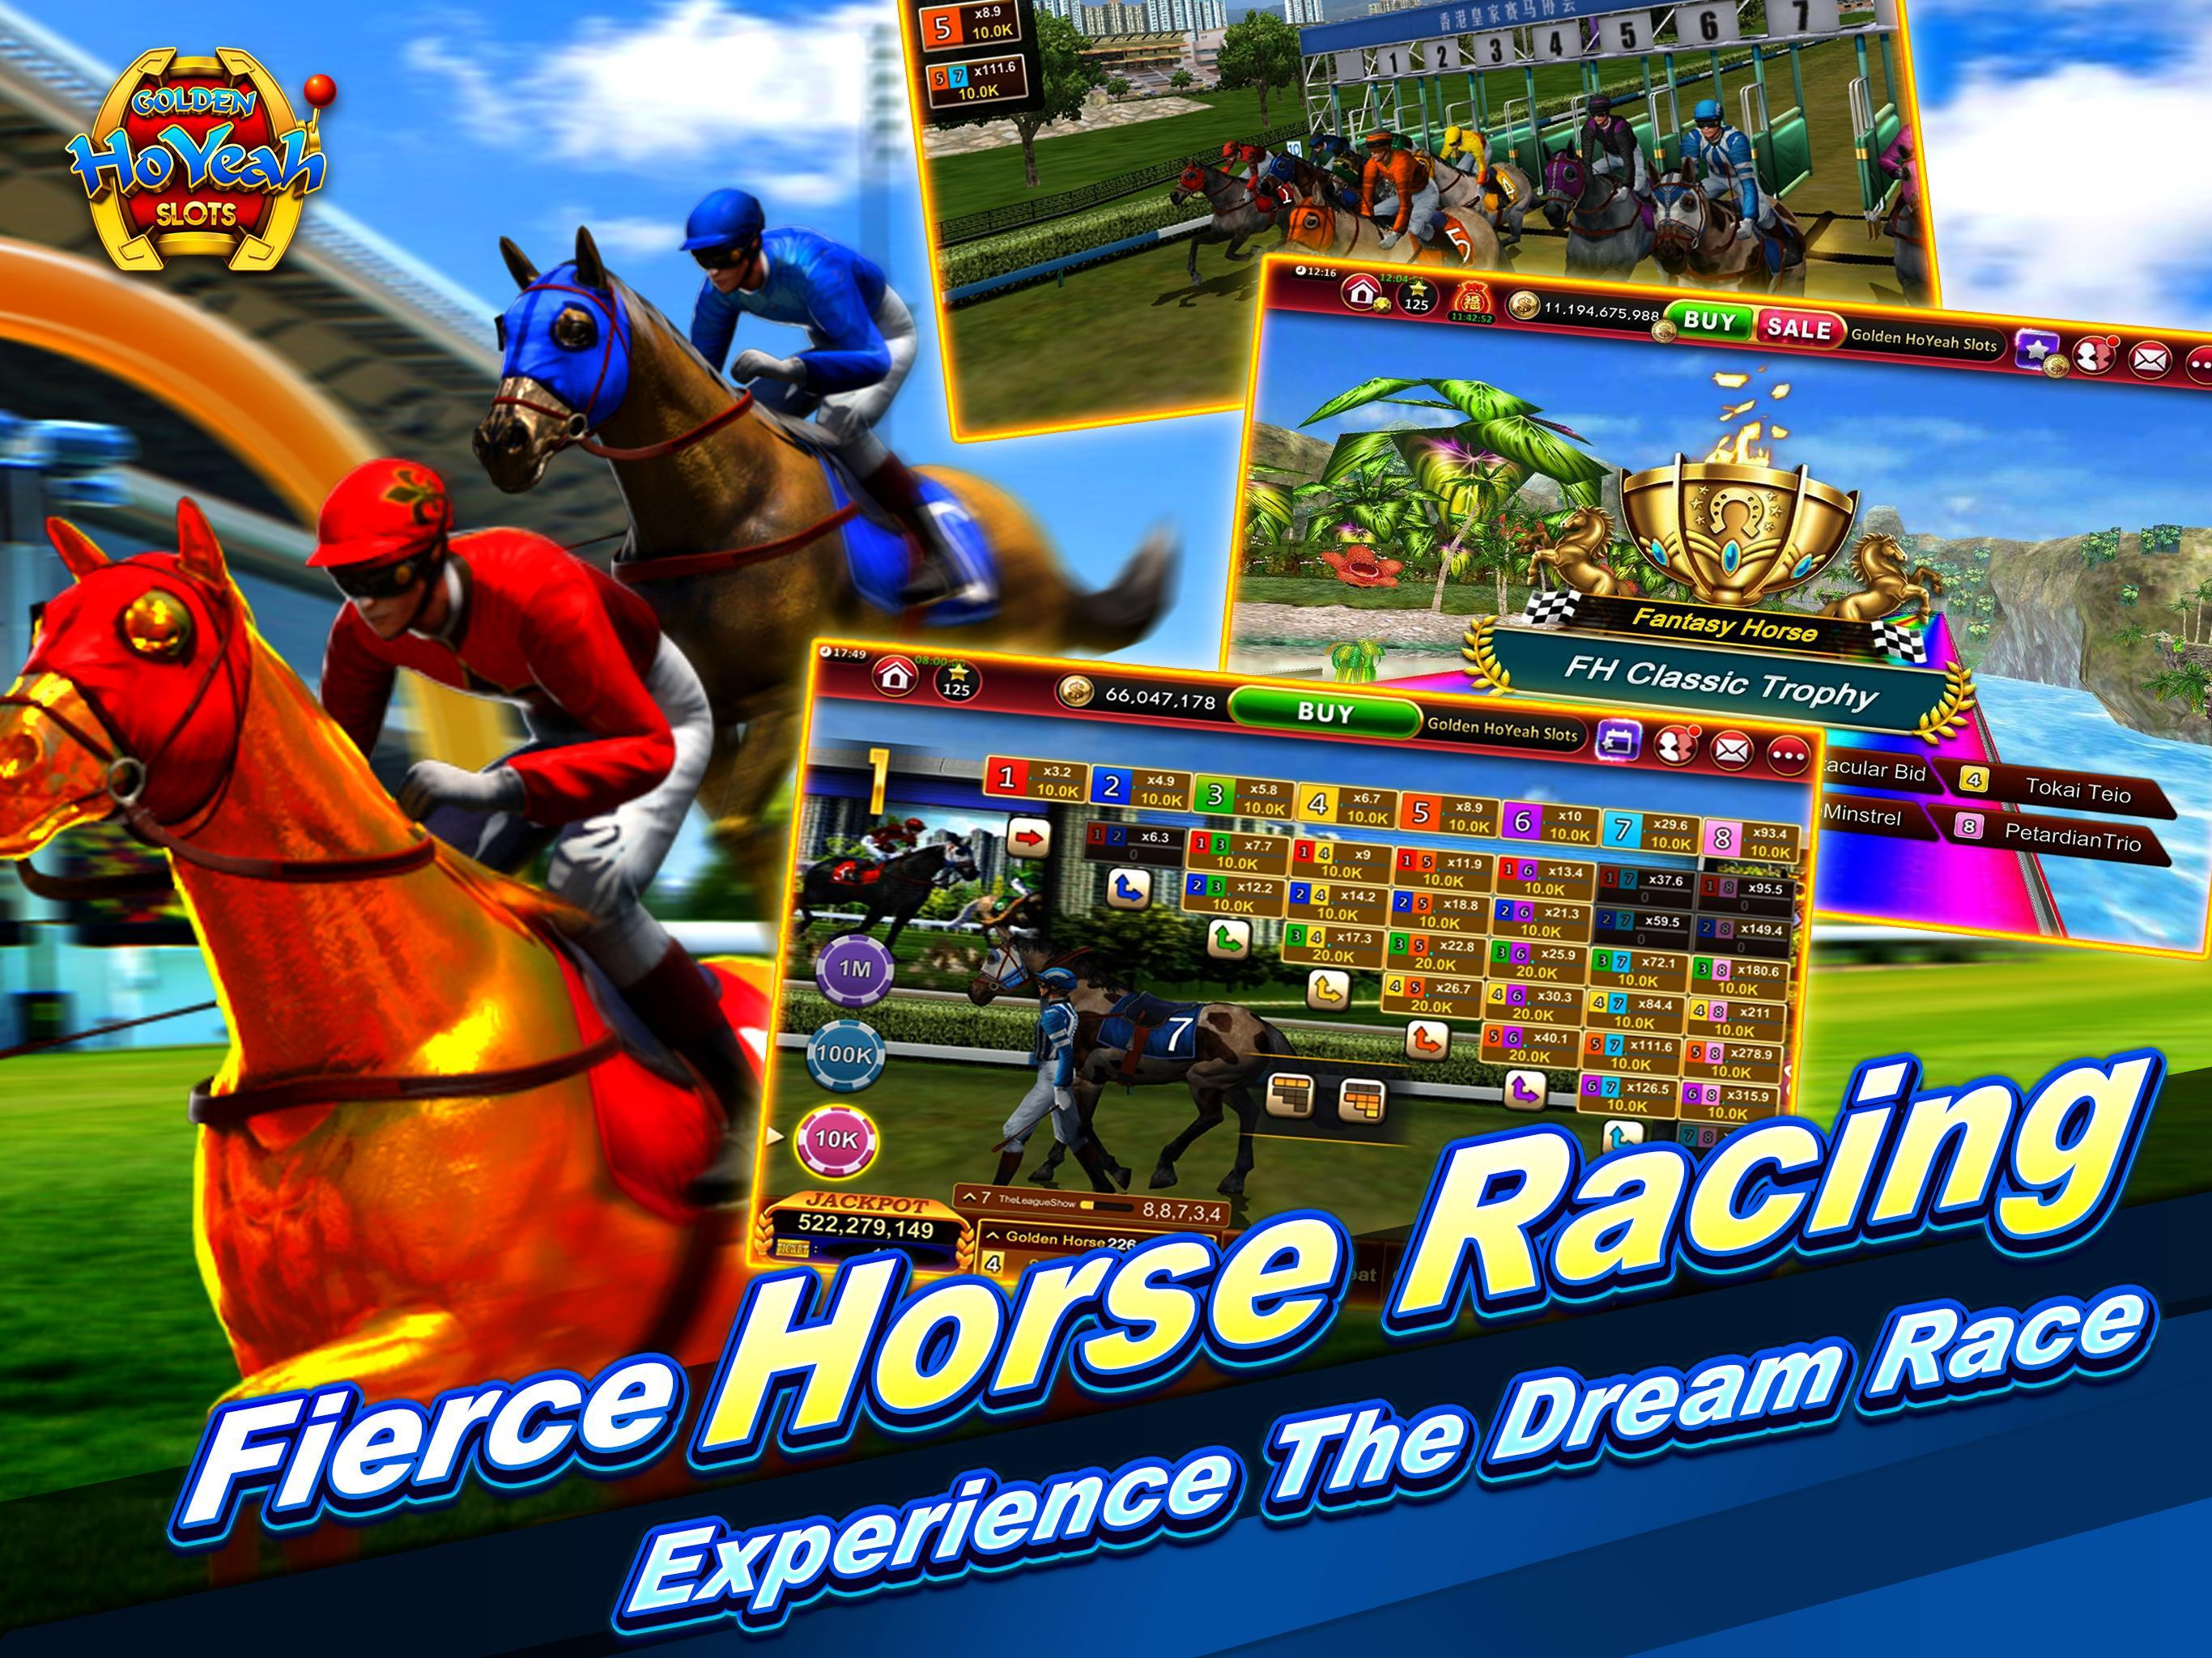 Slots (Golden HoYeah) - Casino Slots 2.5.7 Screenshot 1